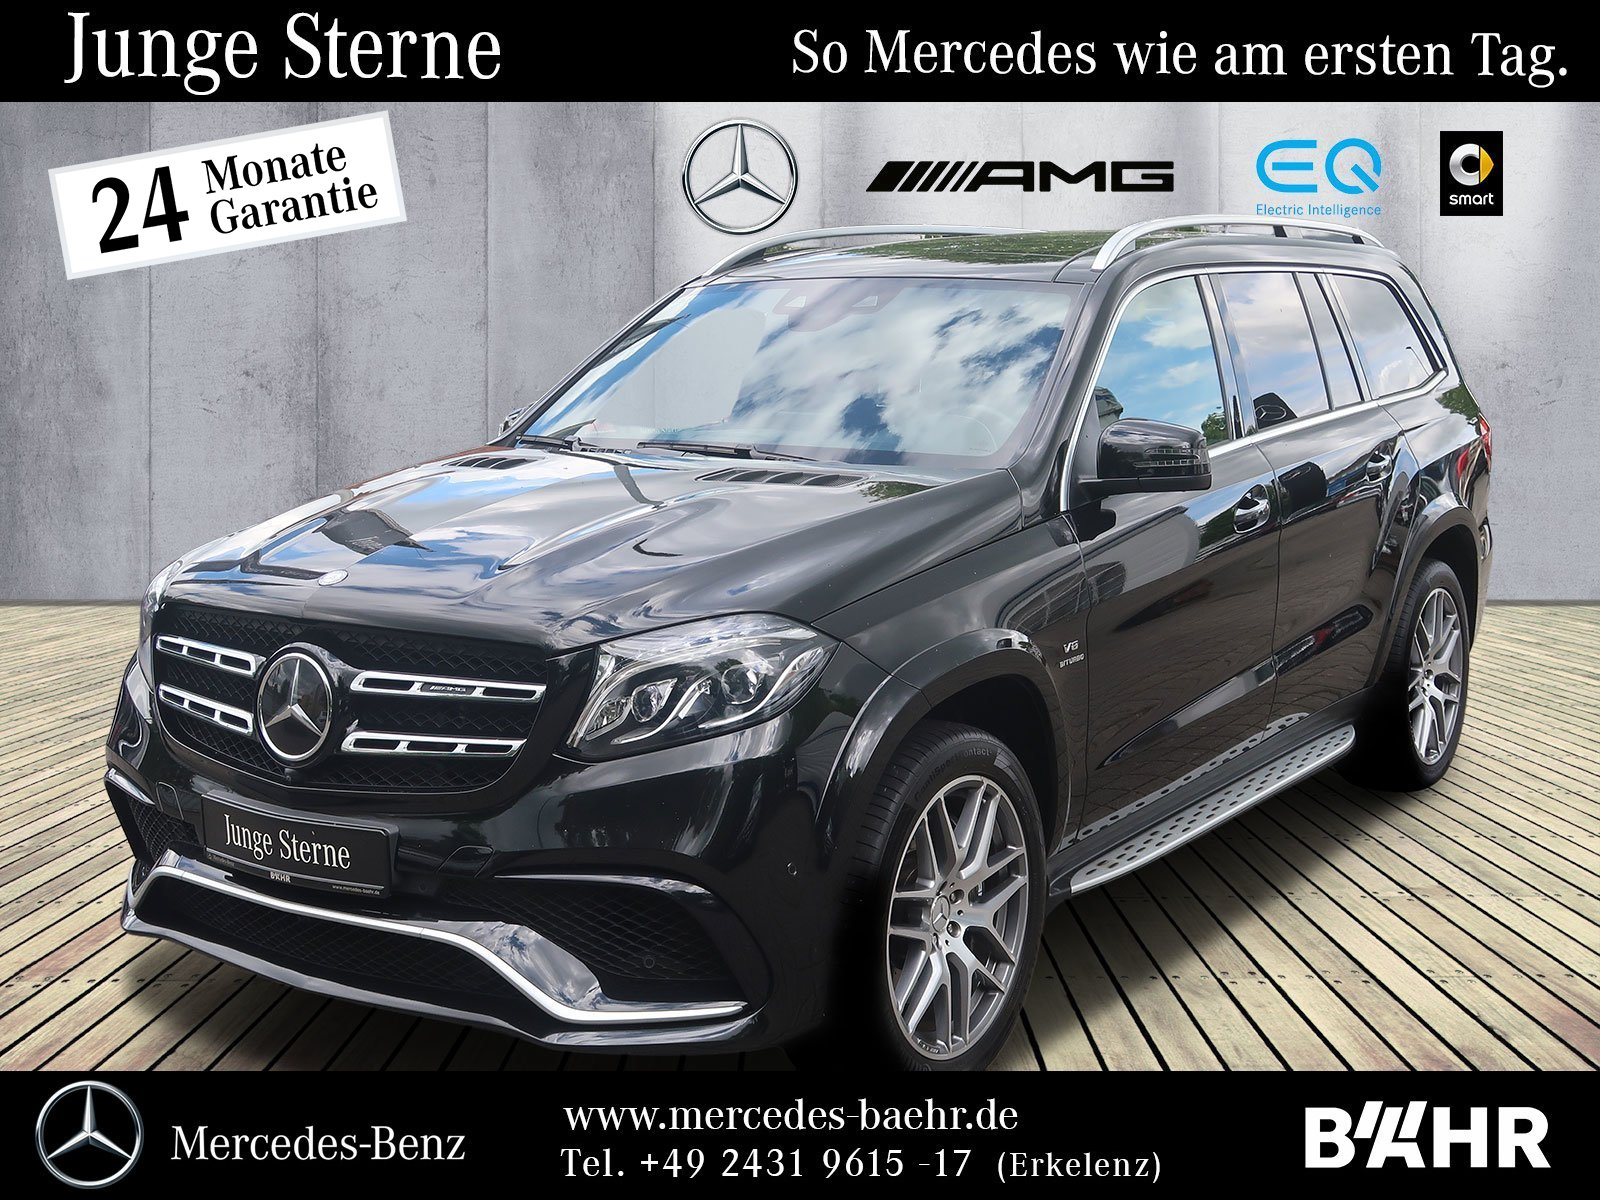 "Mercedes-Benz GLS 63 AMG 4M Comand/LED-ILS/AHK/Airmatic/LMR21"", Jahr 2017, petrol"